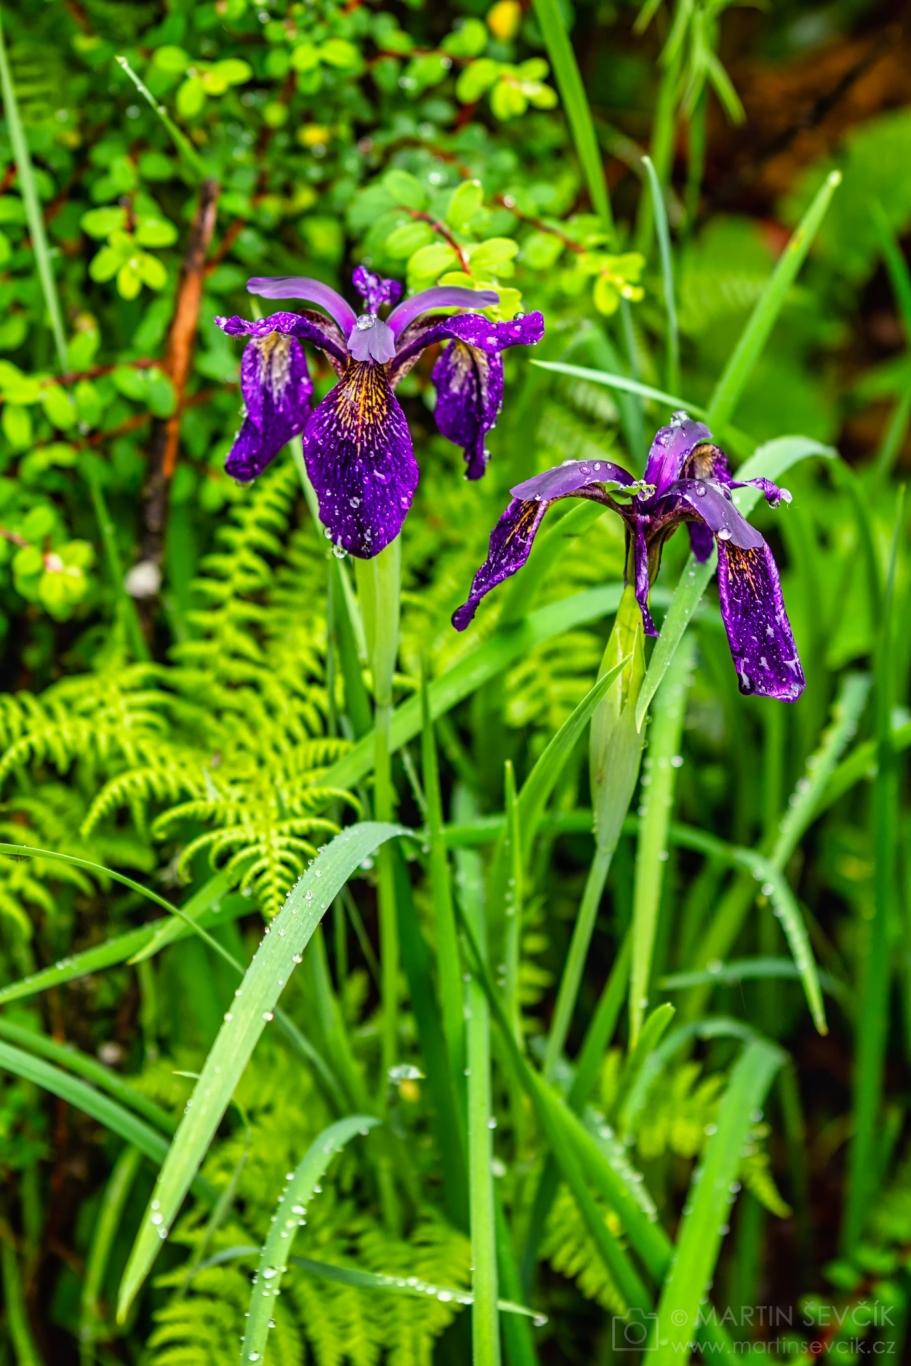 Wet Siberian iris in a nature reserve Potatso (Pudacuo) - Shangri-La